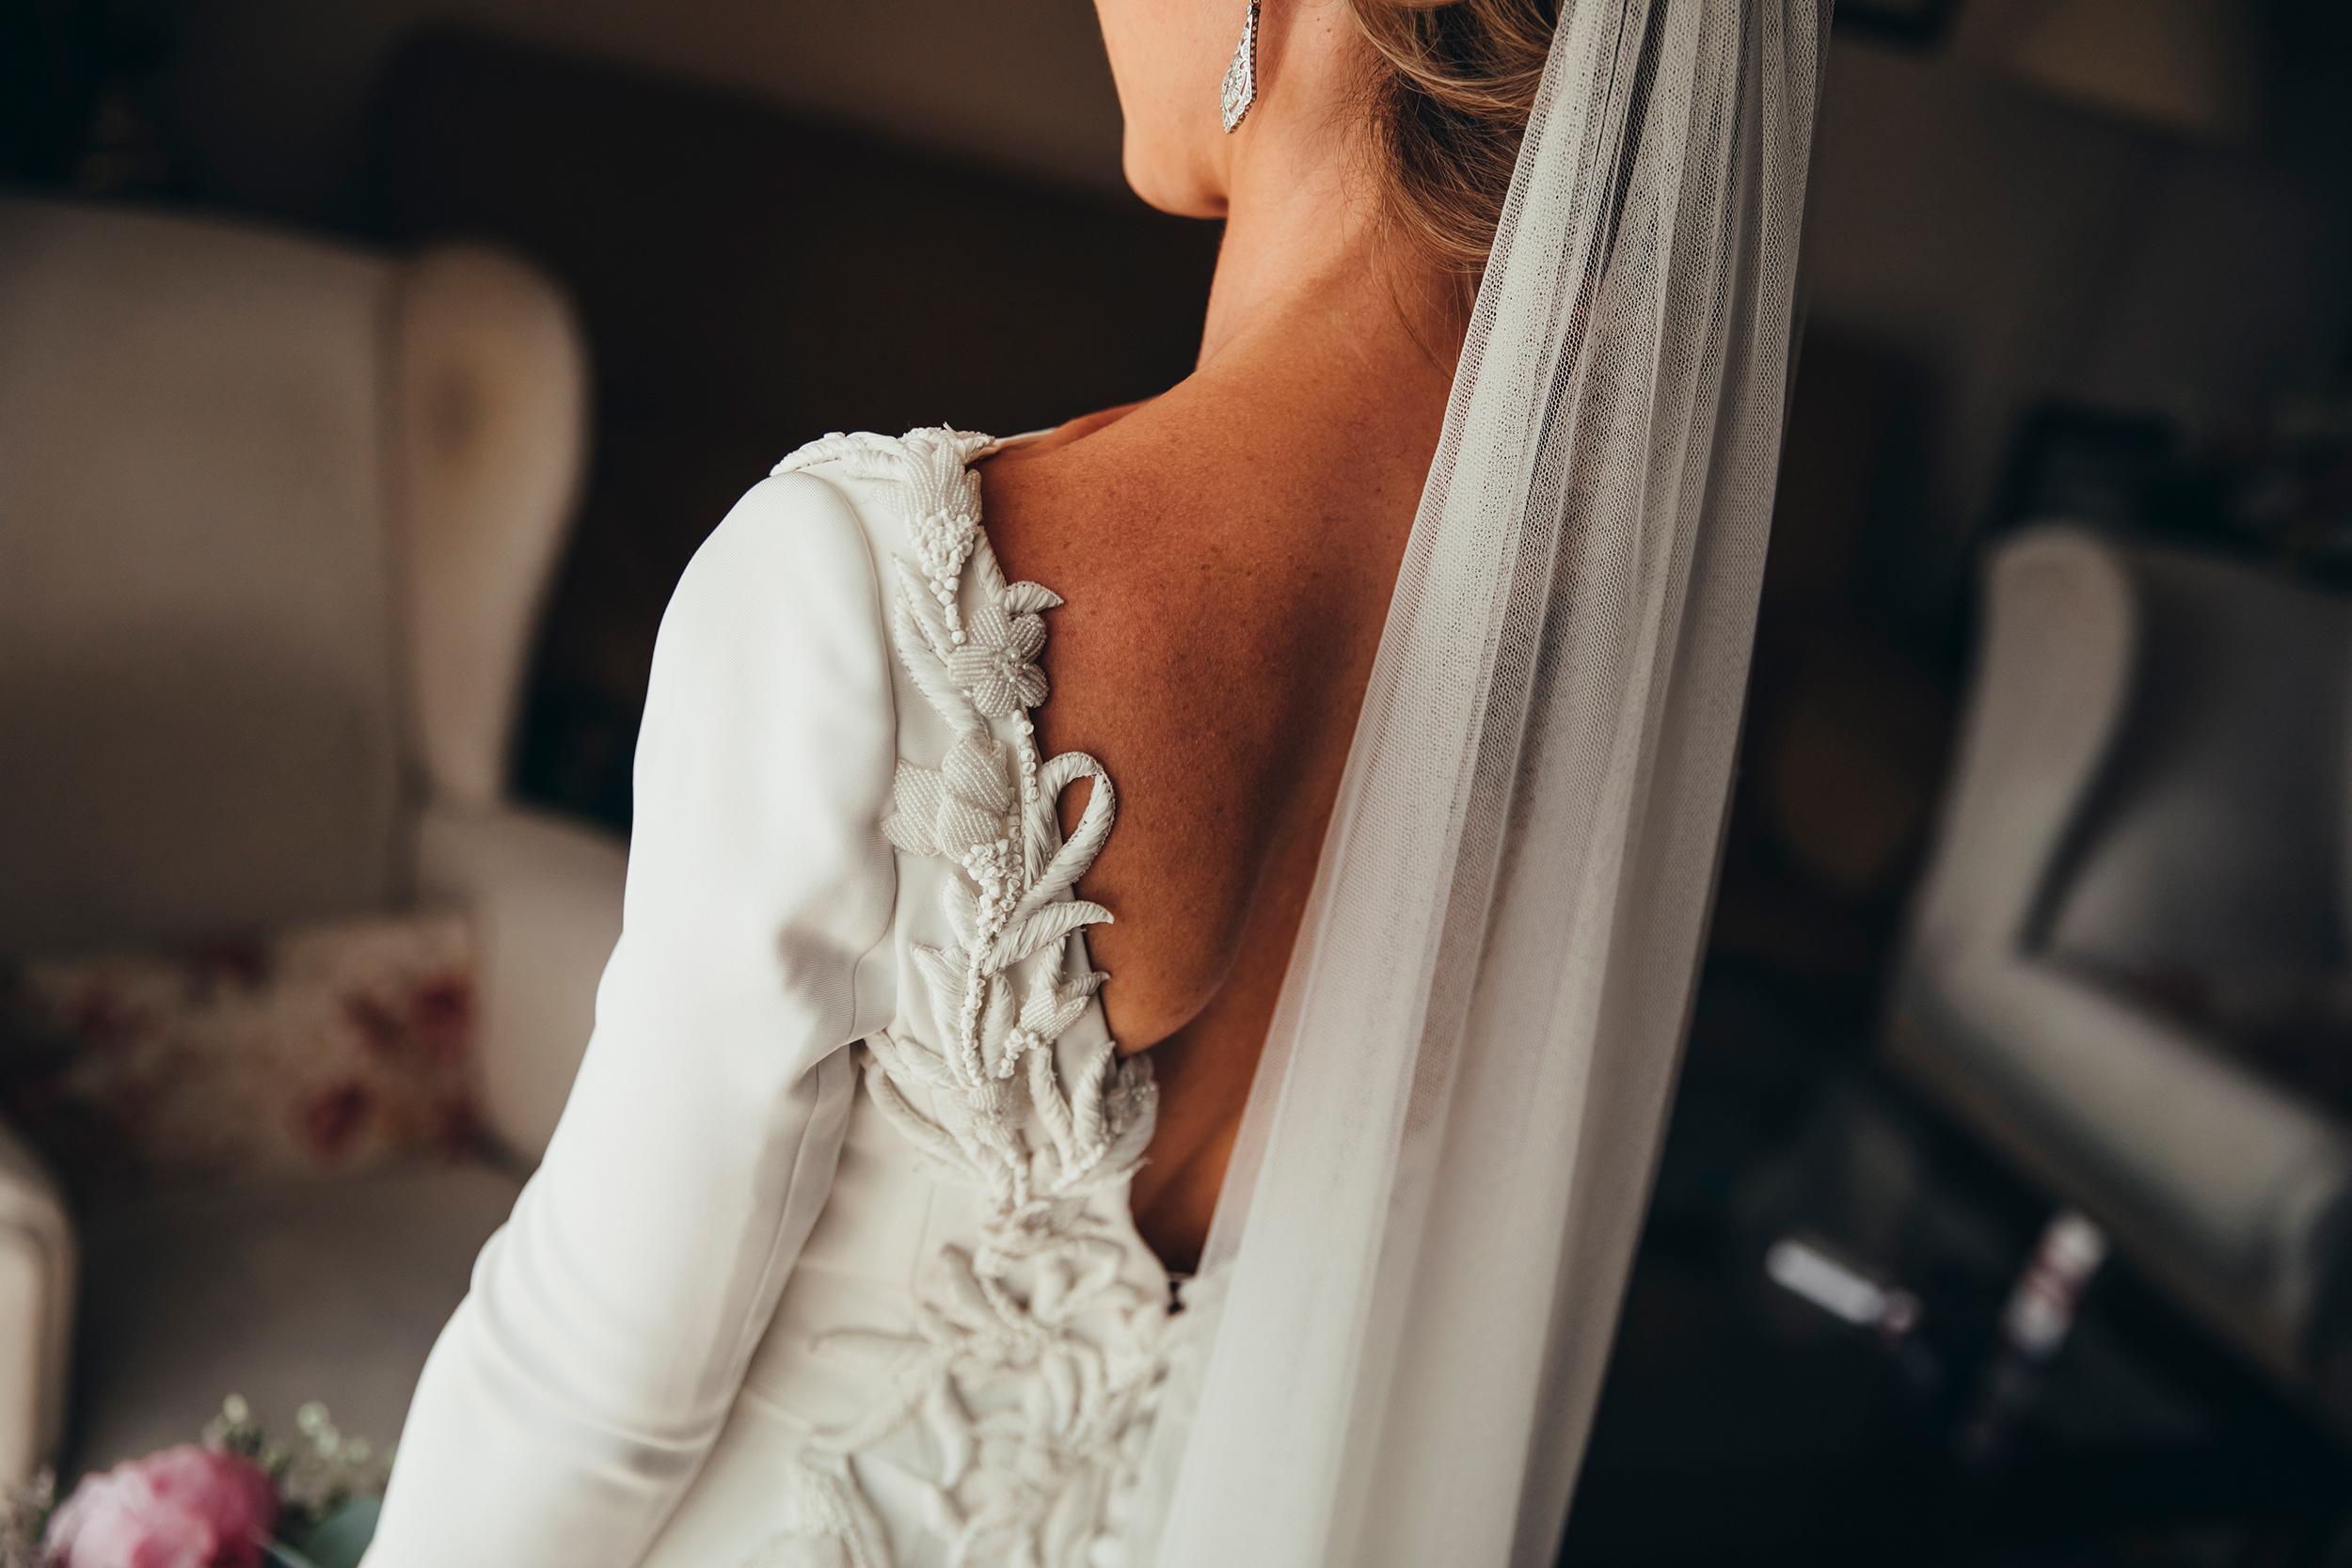 fotografo-bodas-granada-catedral-sagrario-jose-reyes_018.jpg